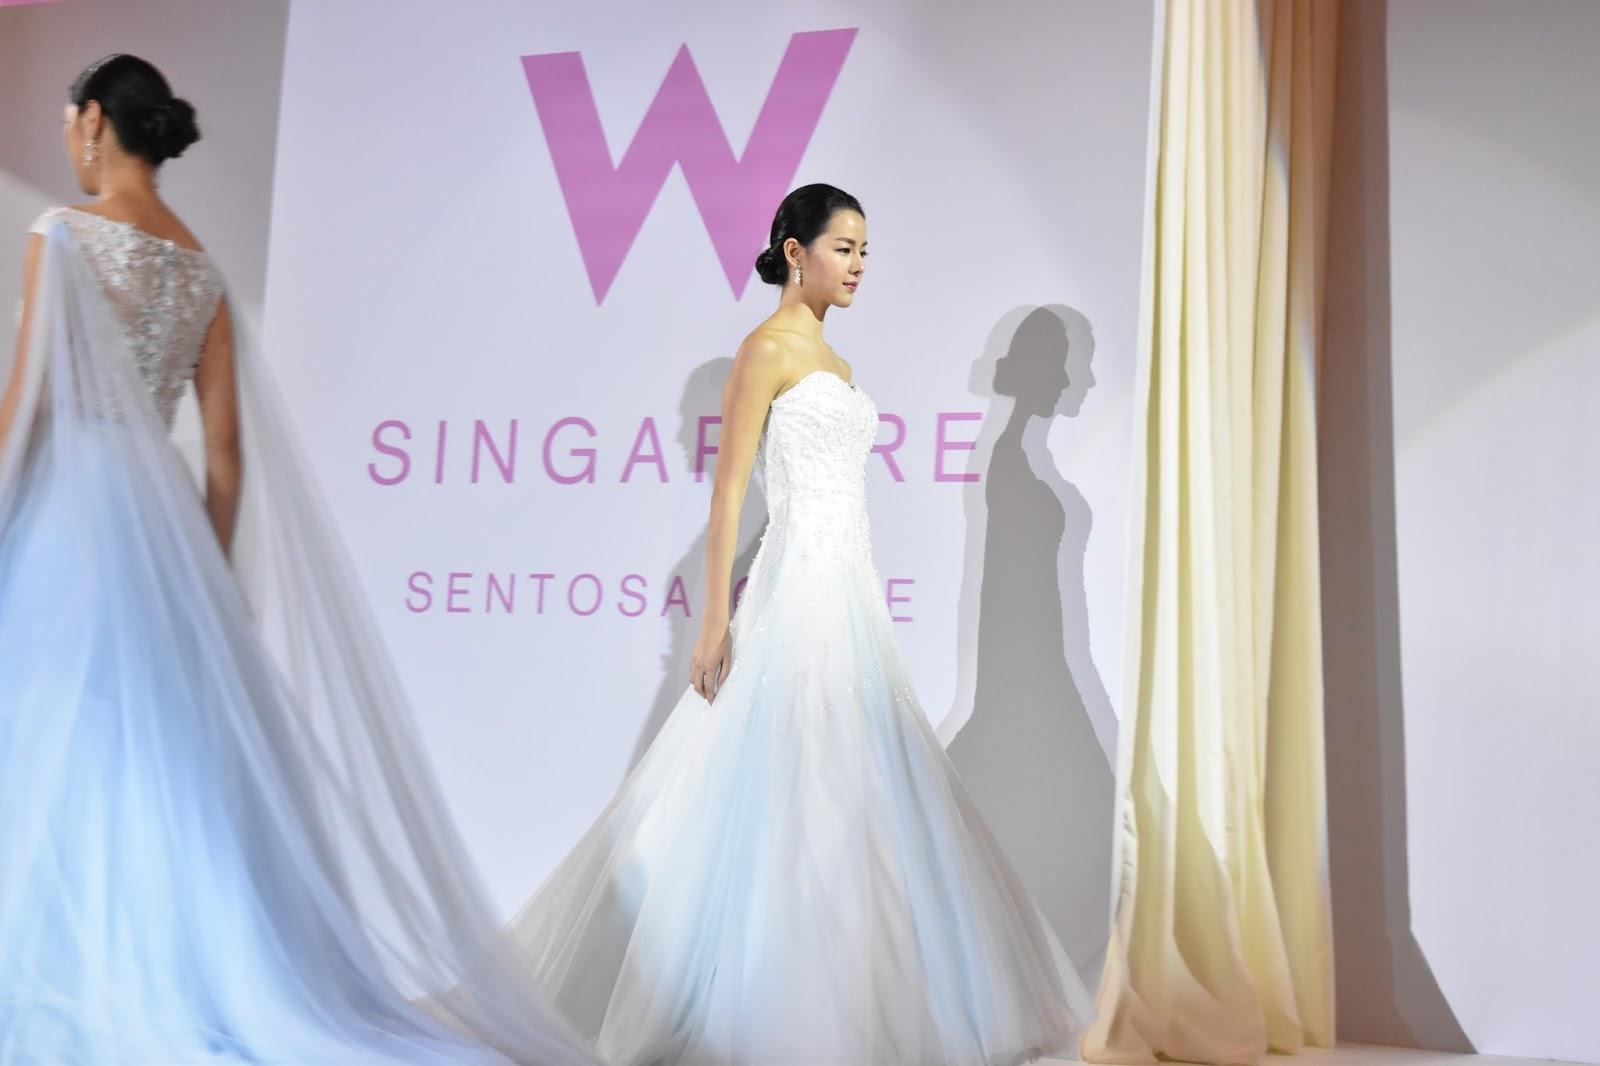 Korean Style Wedding Dress 13 Spectacular Last week I was